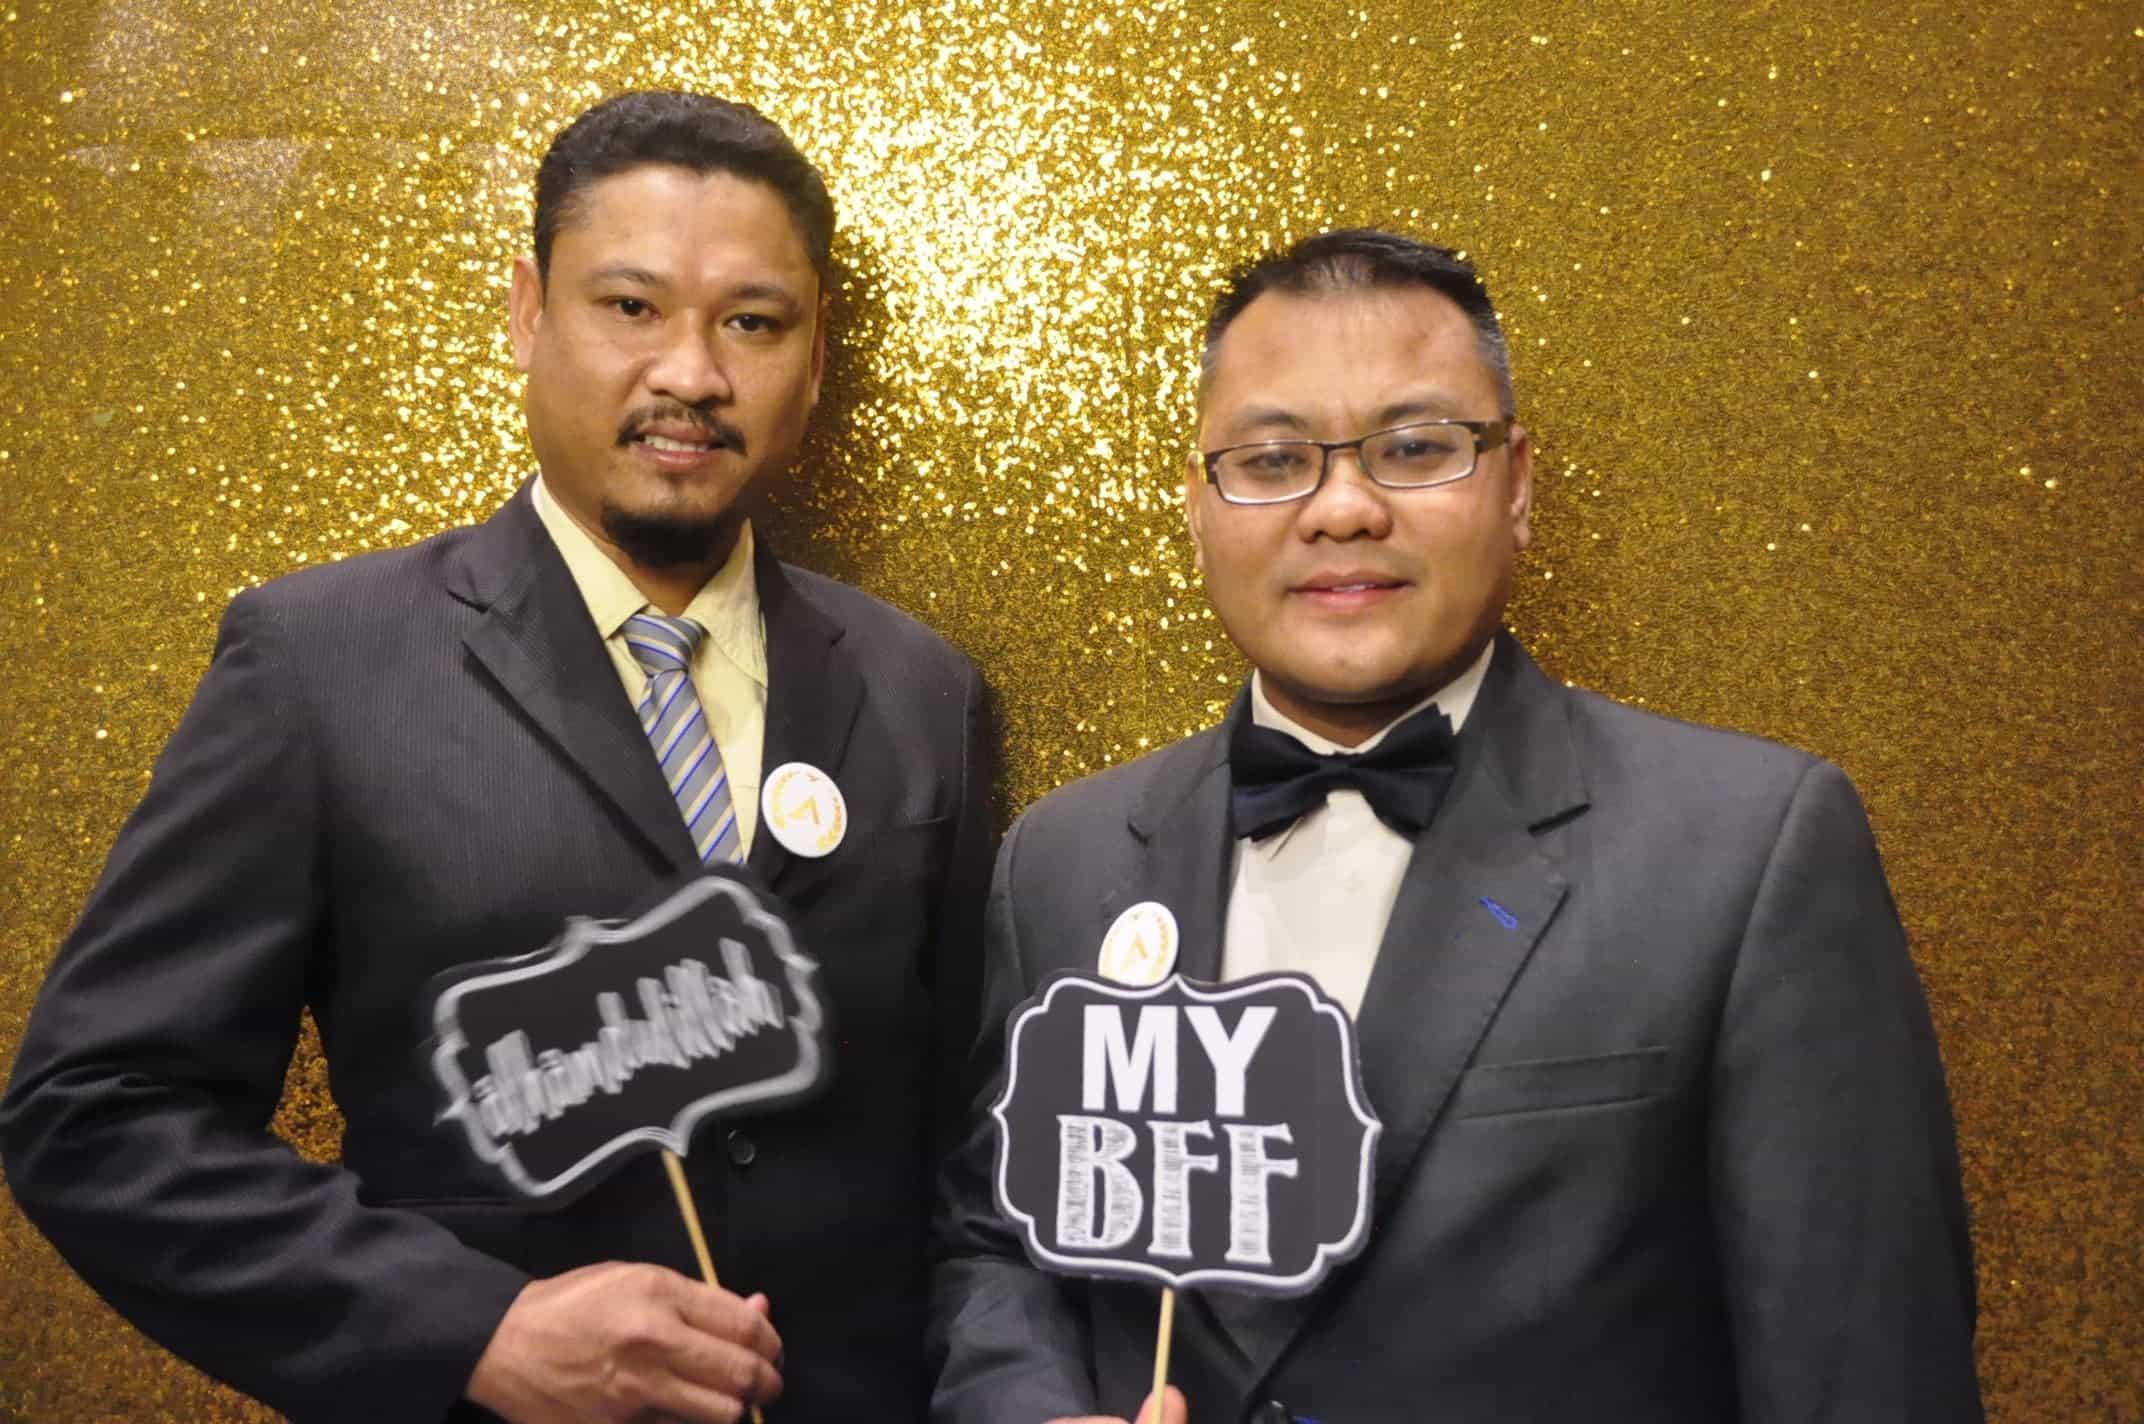 Malam Gala Anggun 2018 (Photobooth) 24